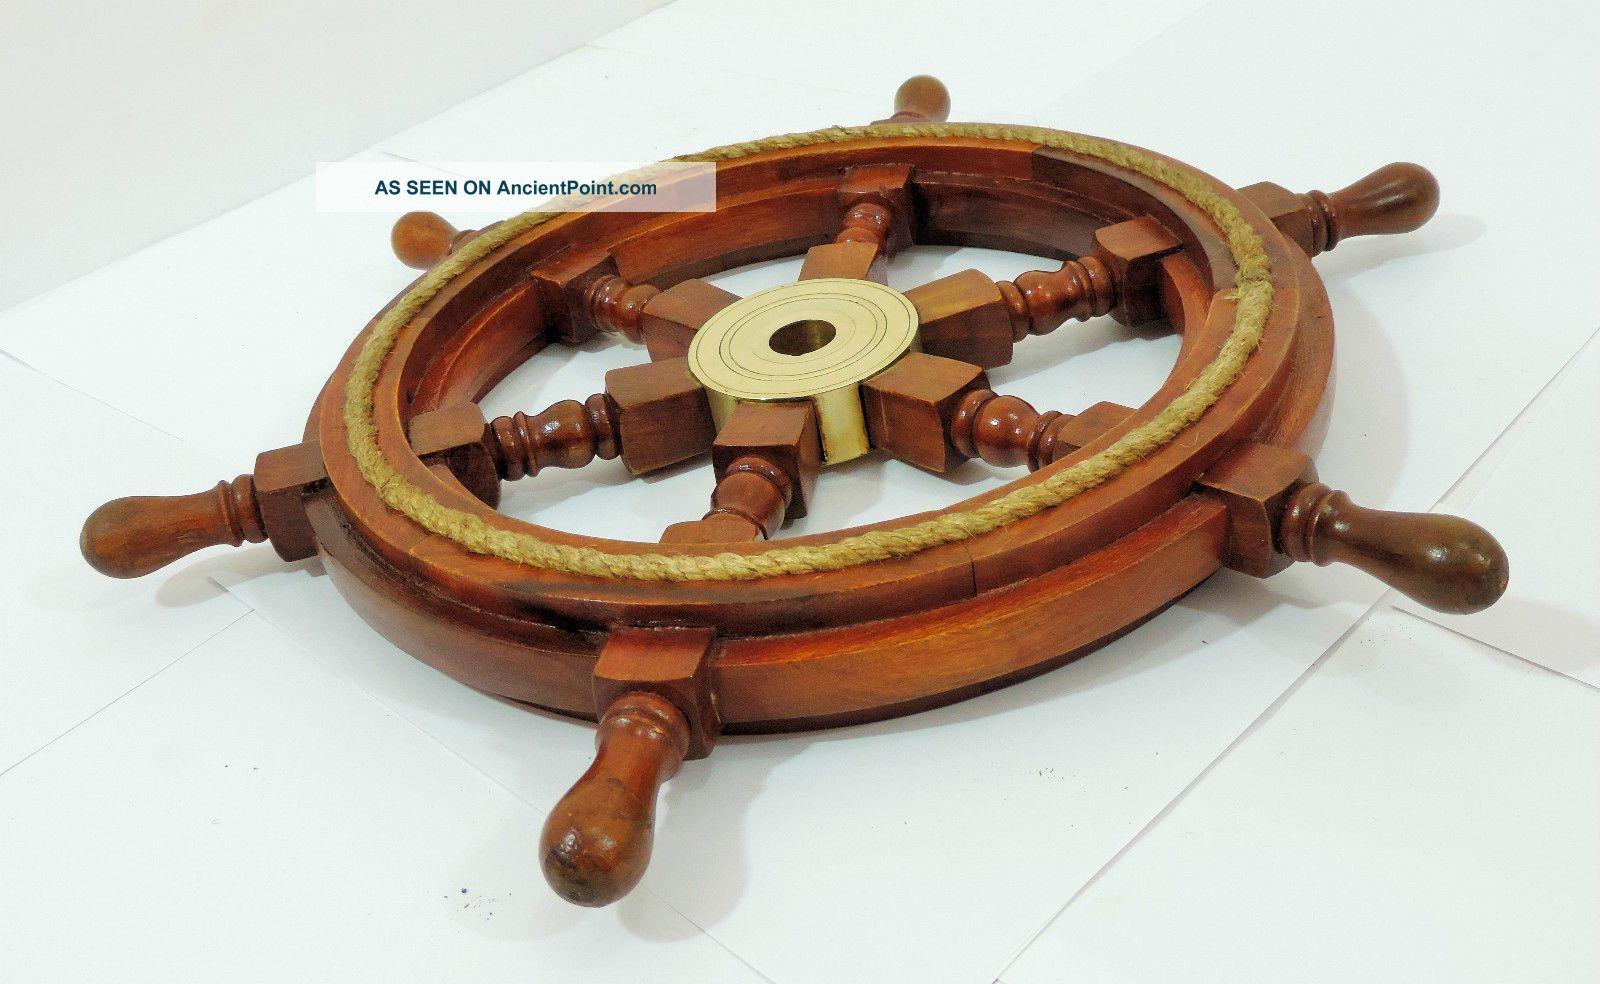 Ship Wheel 18inches Nautical Ship Wheel Boat Steering Wheel Maritime Decor Gift Ship Equipment photo